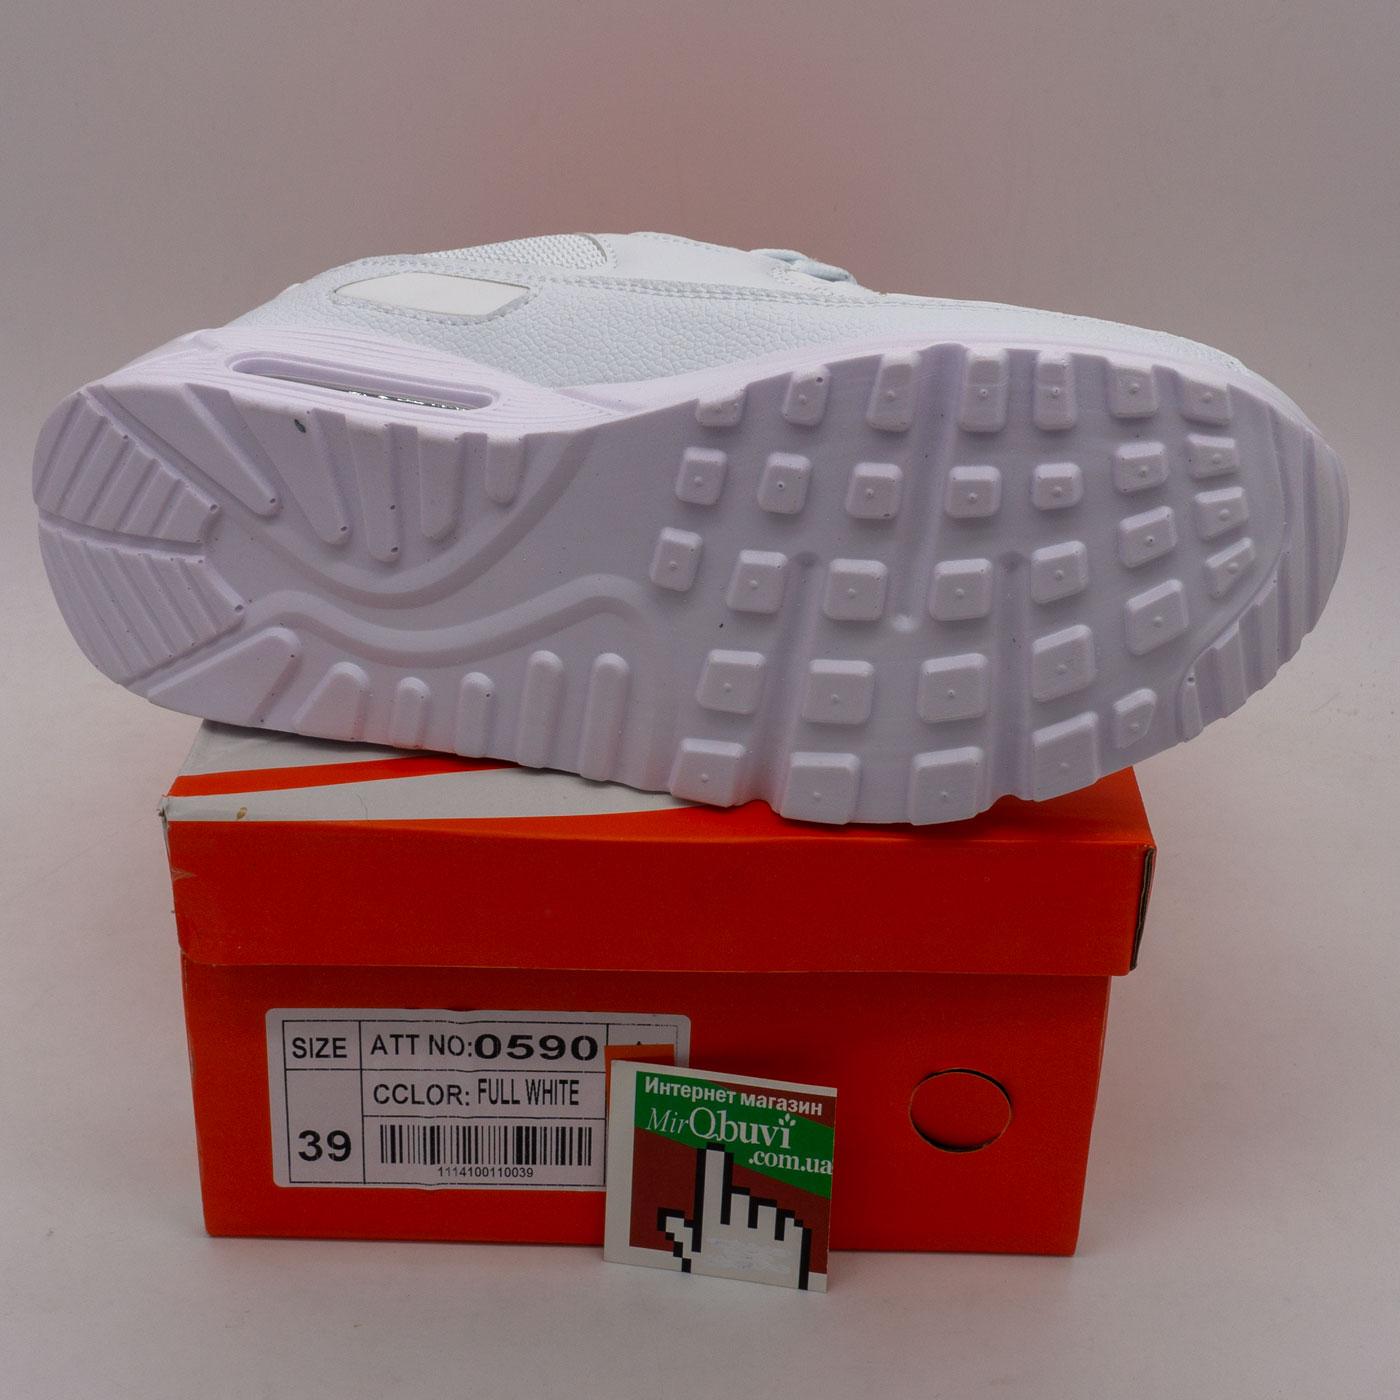 фото front Женские кроссовки max 90 0590 белые front